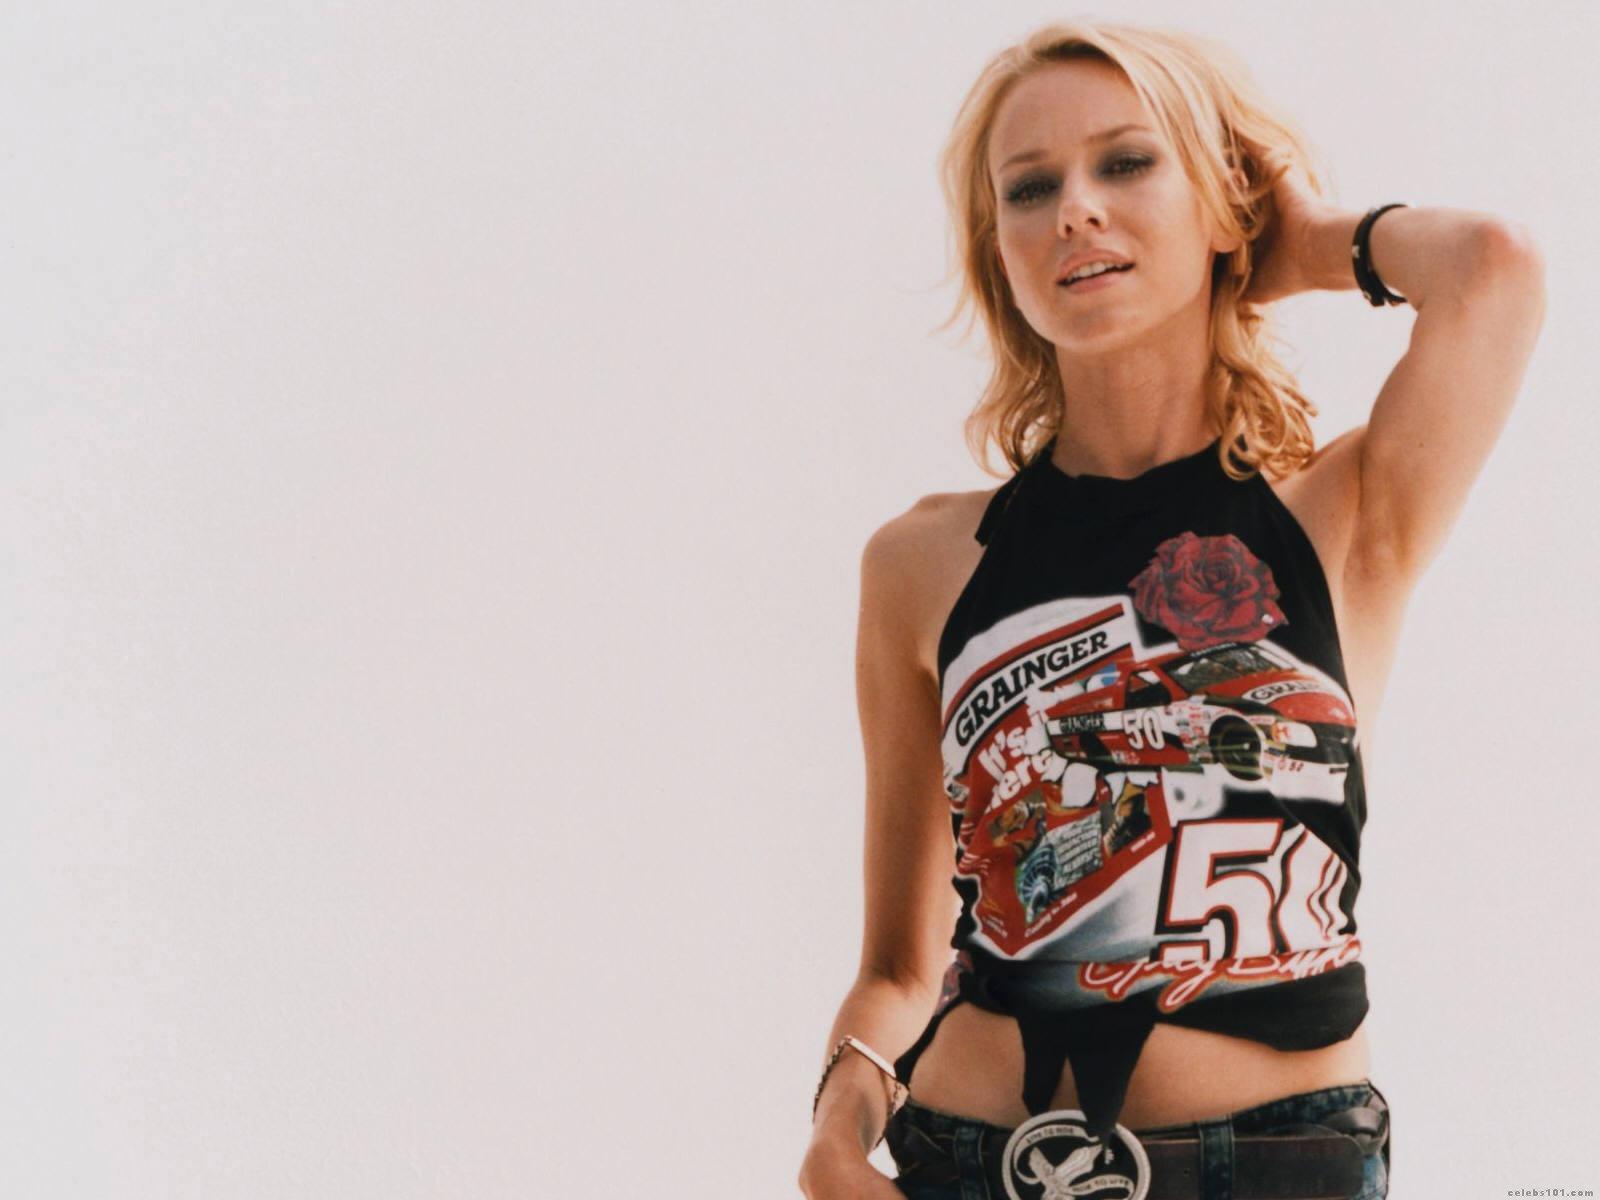 Naomi Watts High quality wallpaper size 1600x1200 of Naomi Watts 1600x1200